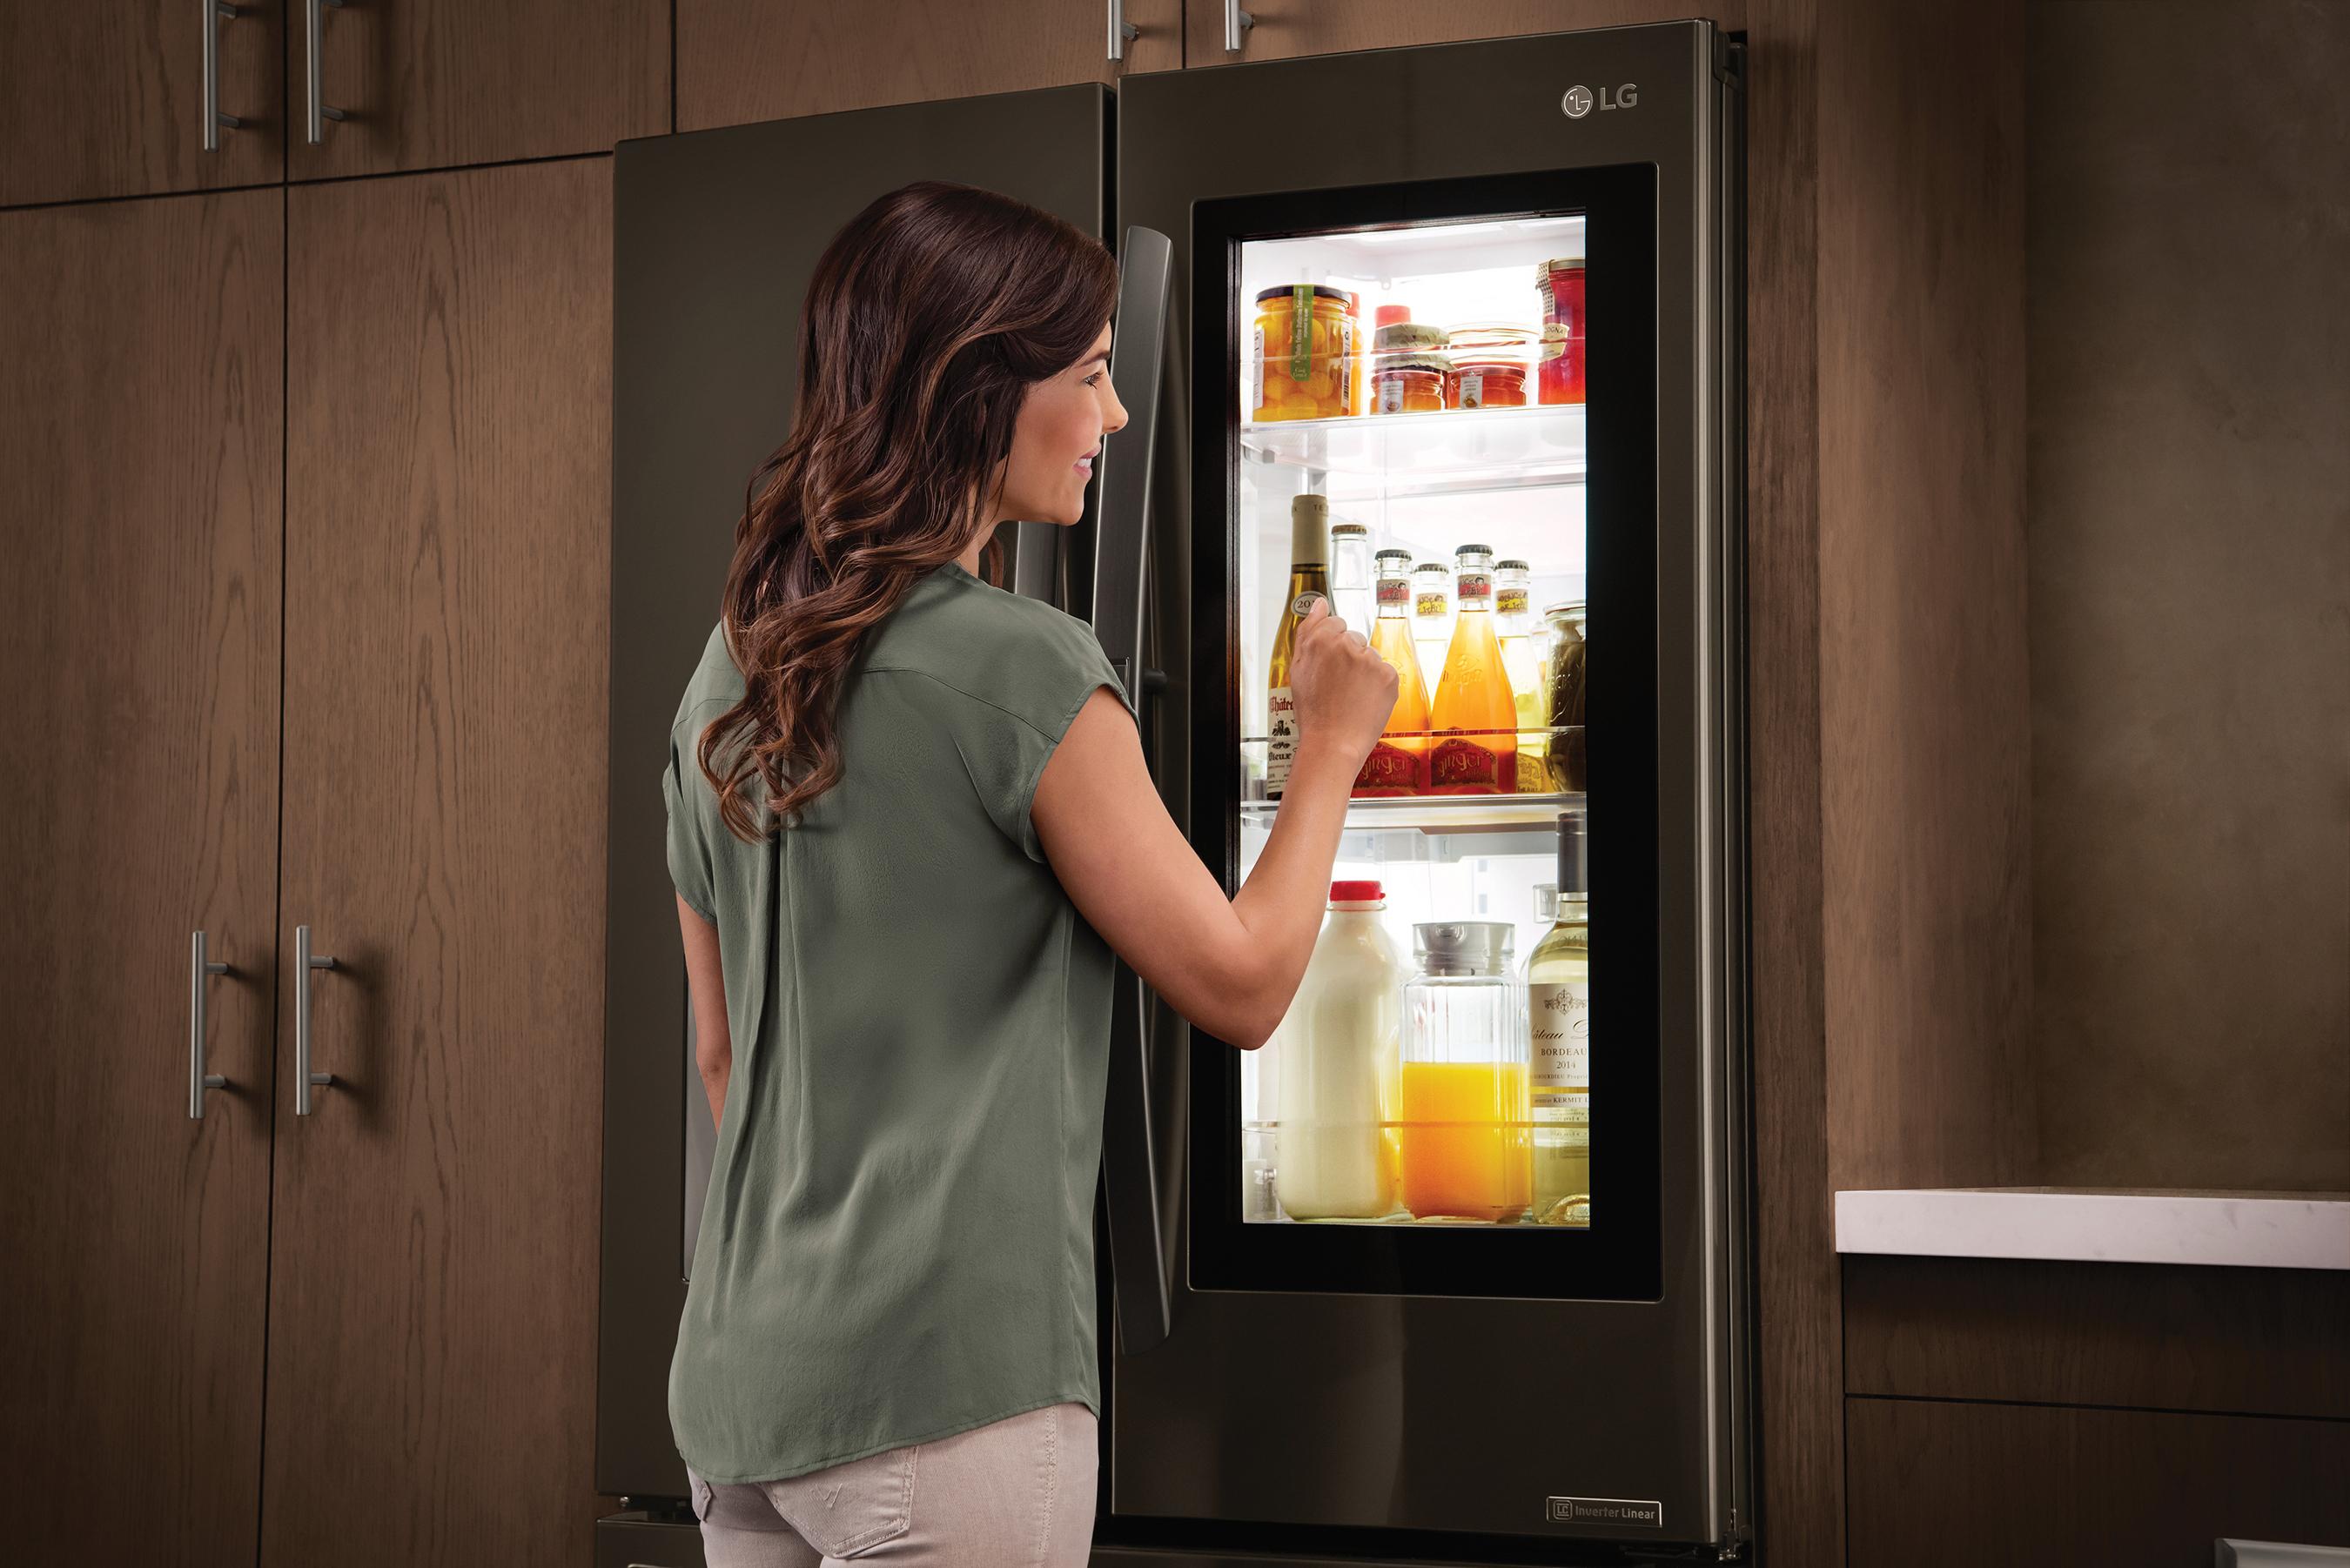 LG InstaView Refrigerator Lifestyle Image